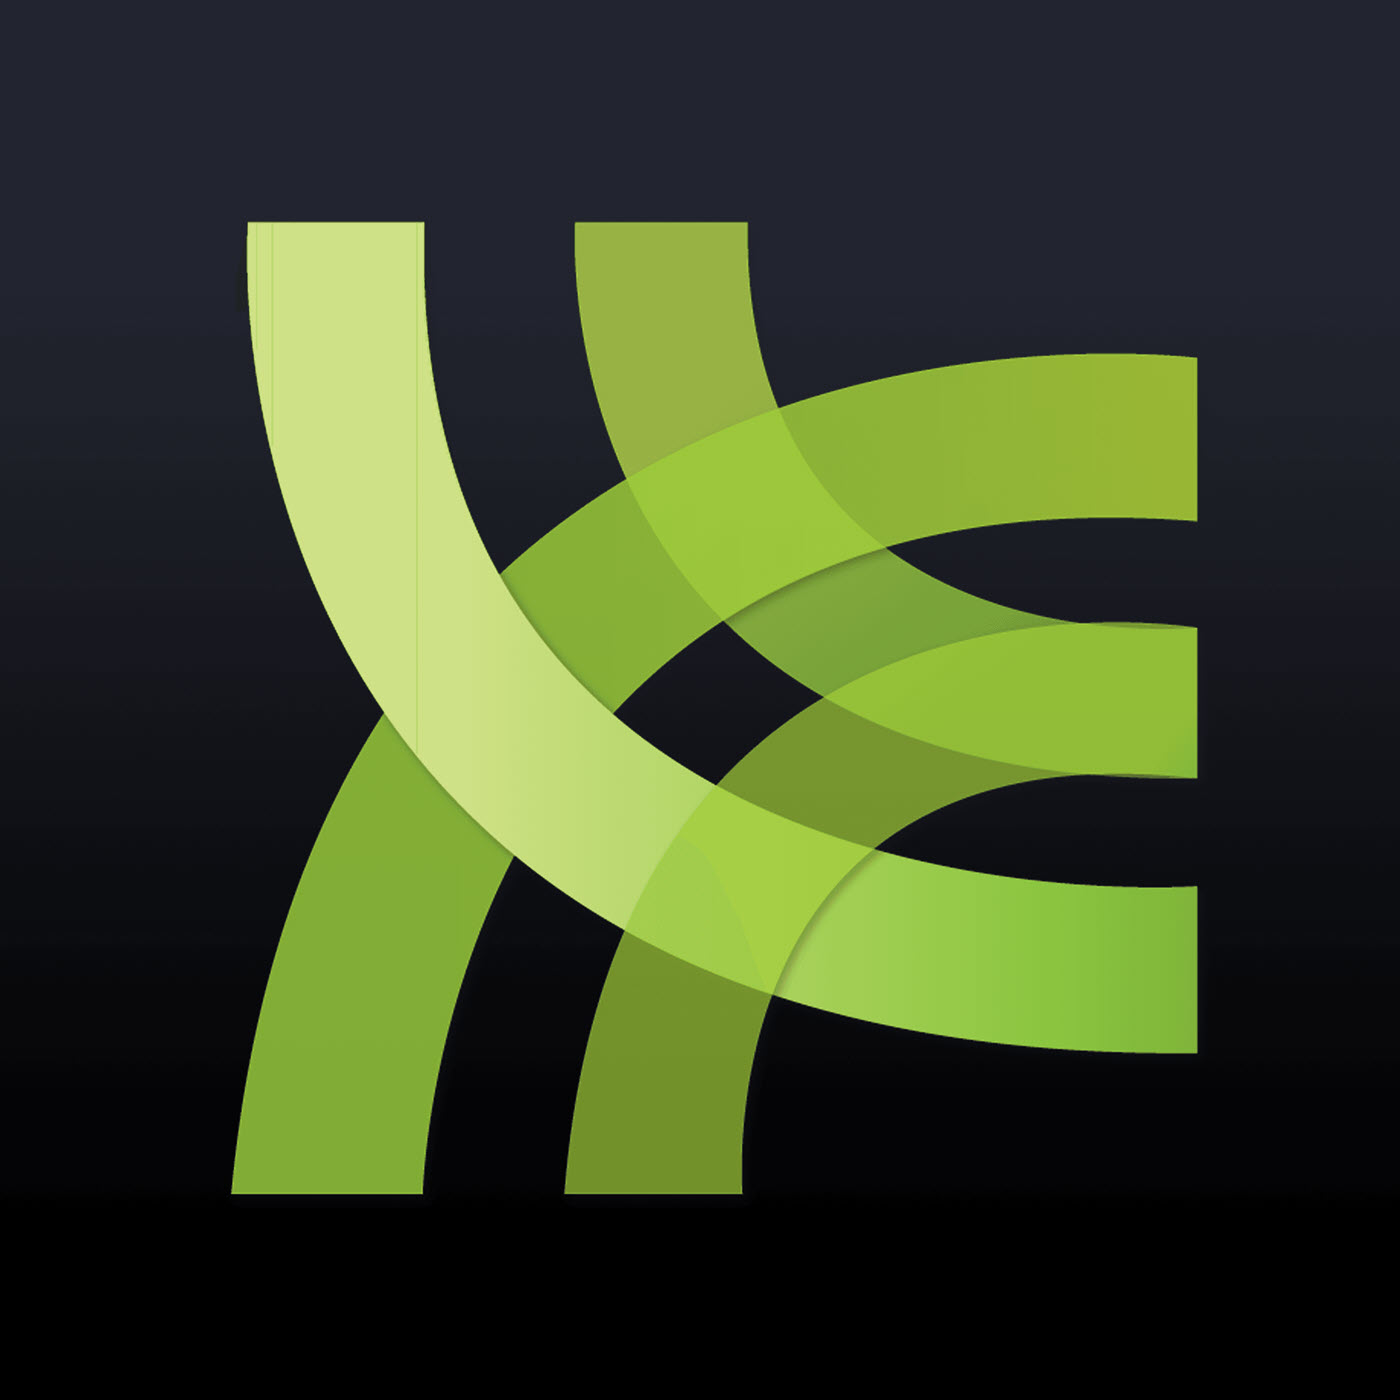 Guild-Gear-from- Jinx.com